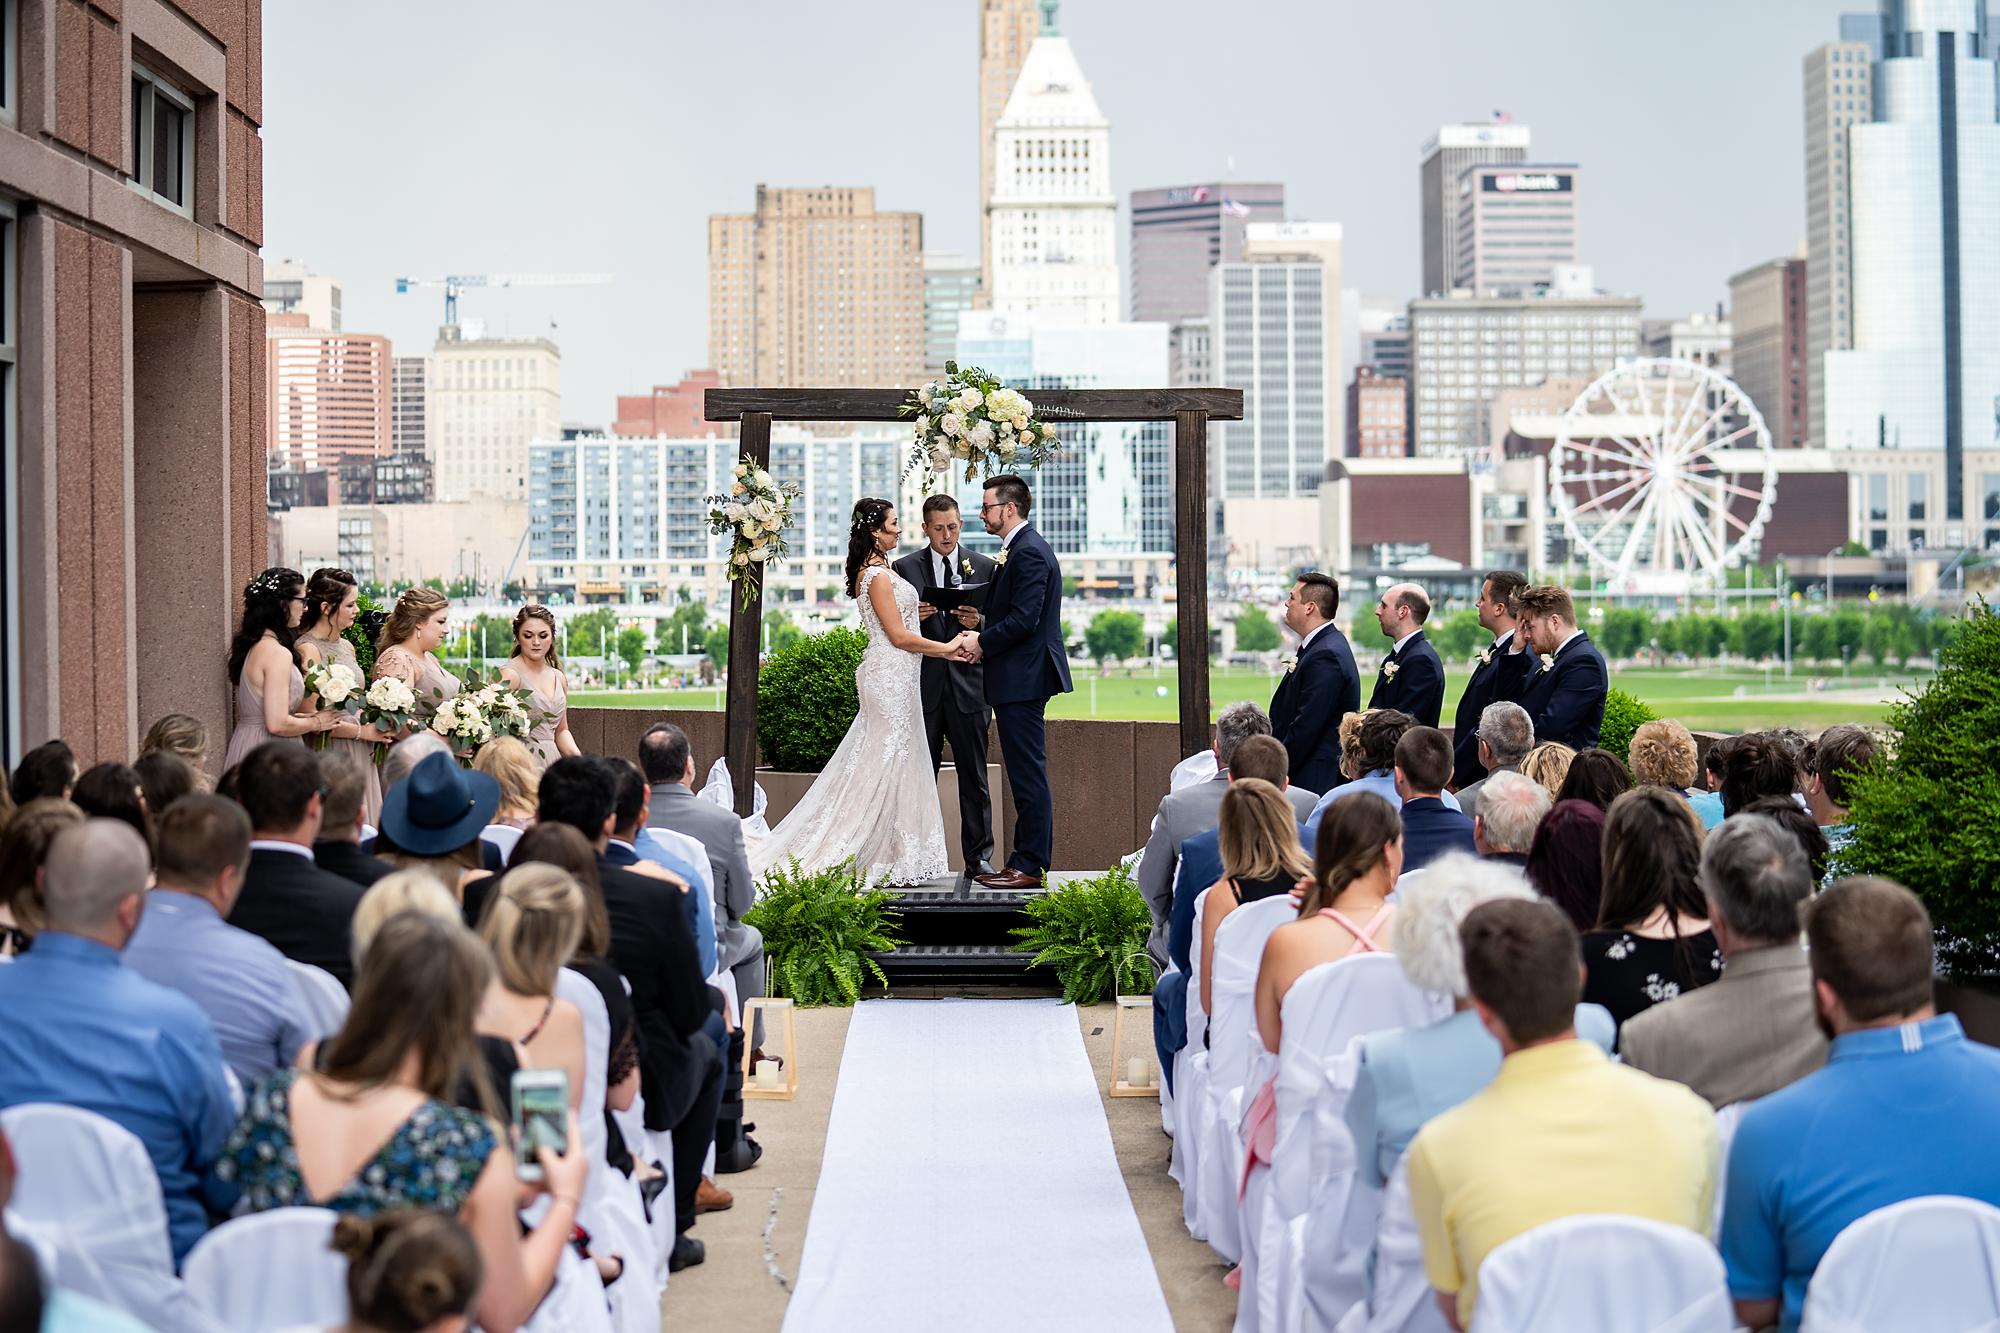 Embassy-Suites-Rivercenter-Wedding-Photography-21.jpg